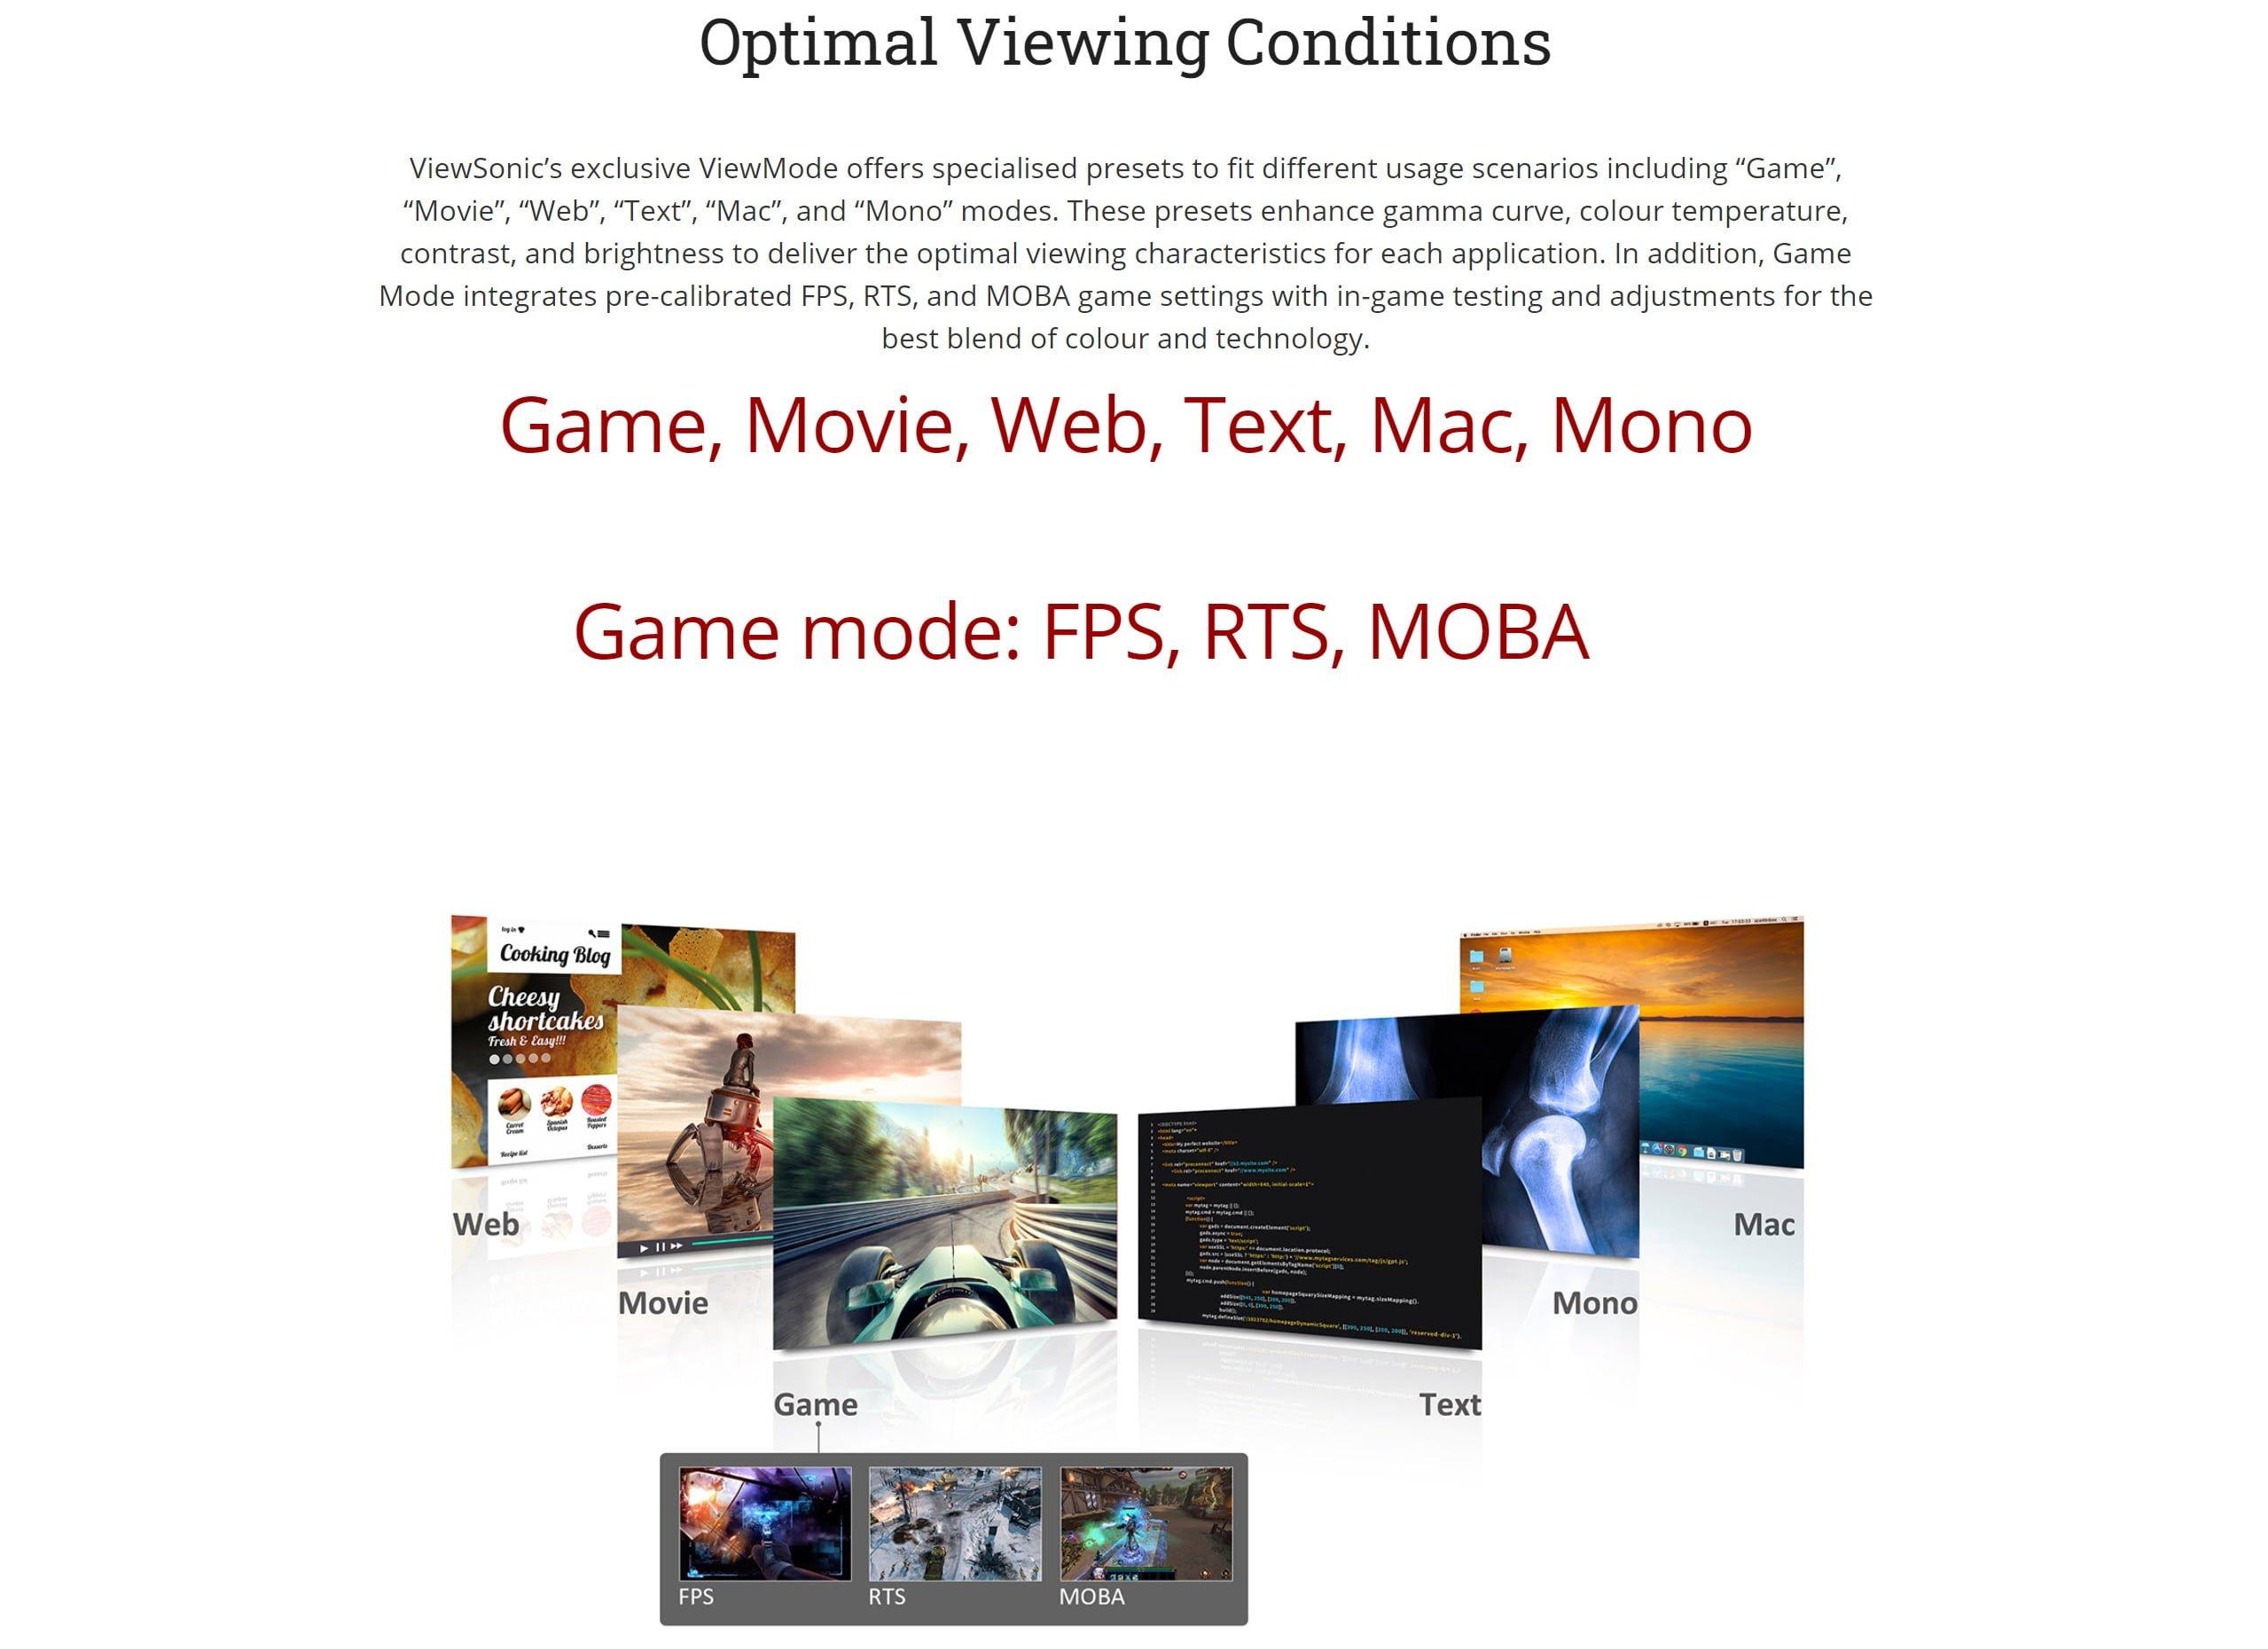 "ViewSonic VX2458-mhd 24″ LED Display, TN Panel FHD, 23.6"" Viewable, 144HZ Refresh Rate – New"